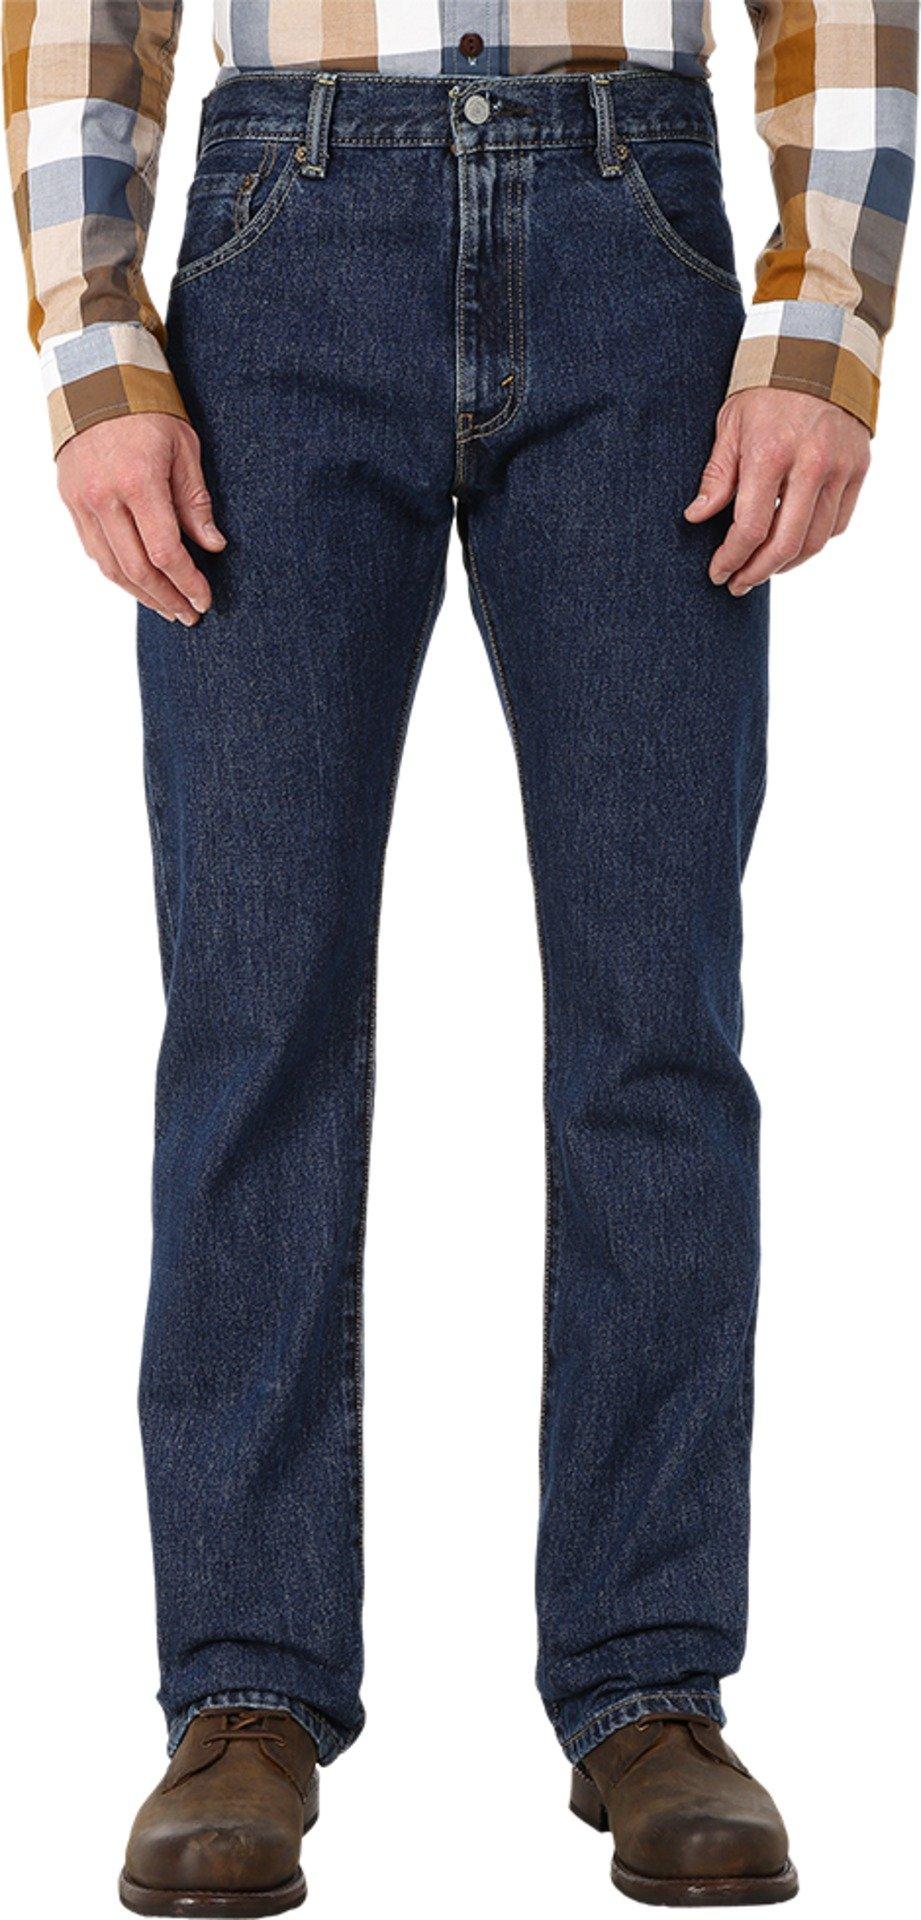 Levi's Men's 517 Boot Cut Jean, Dark Stonewash, 31x32